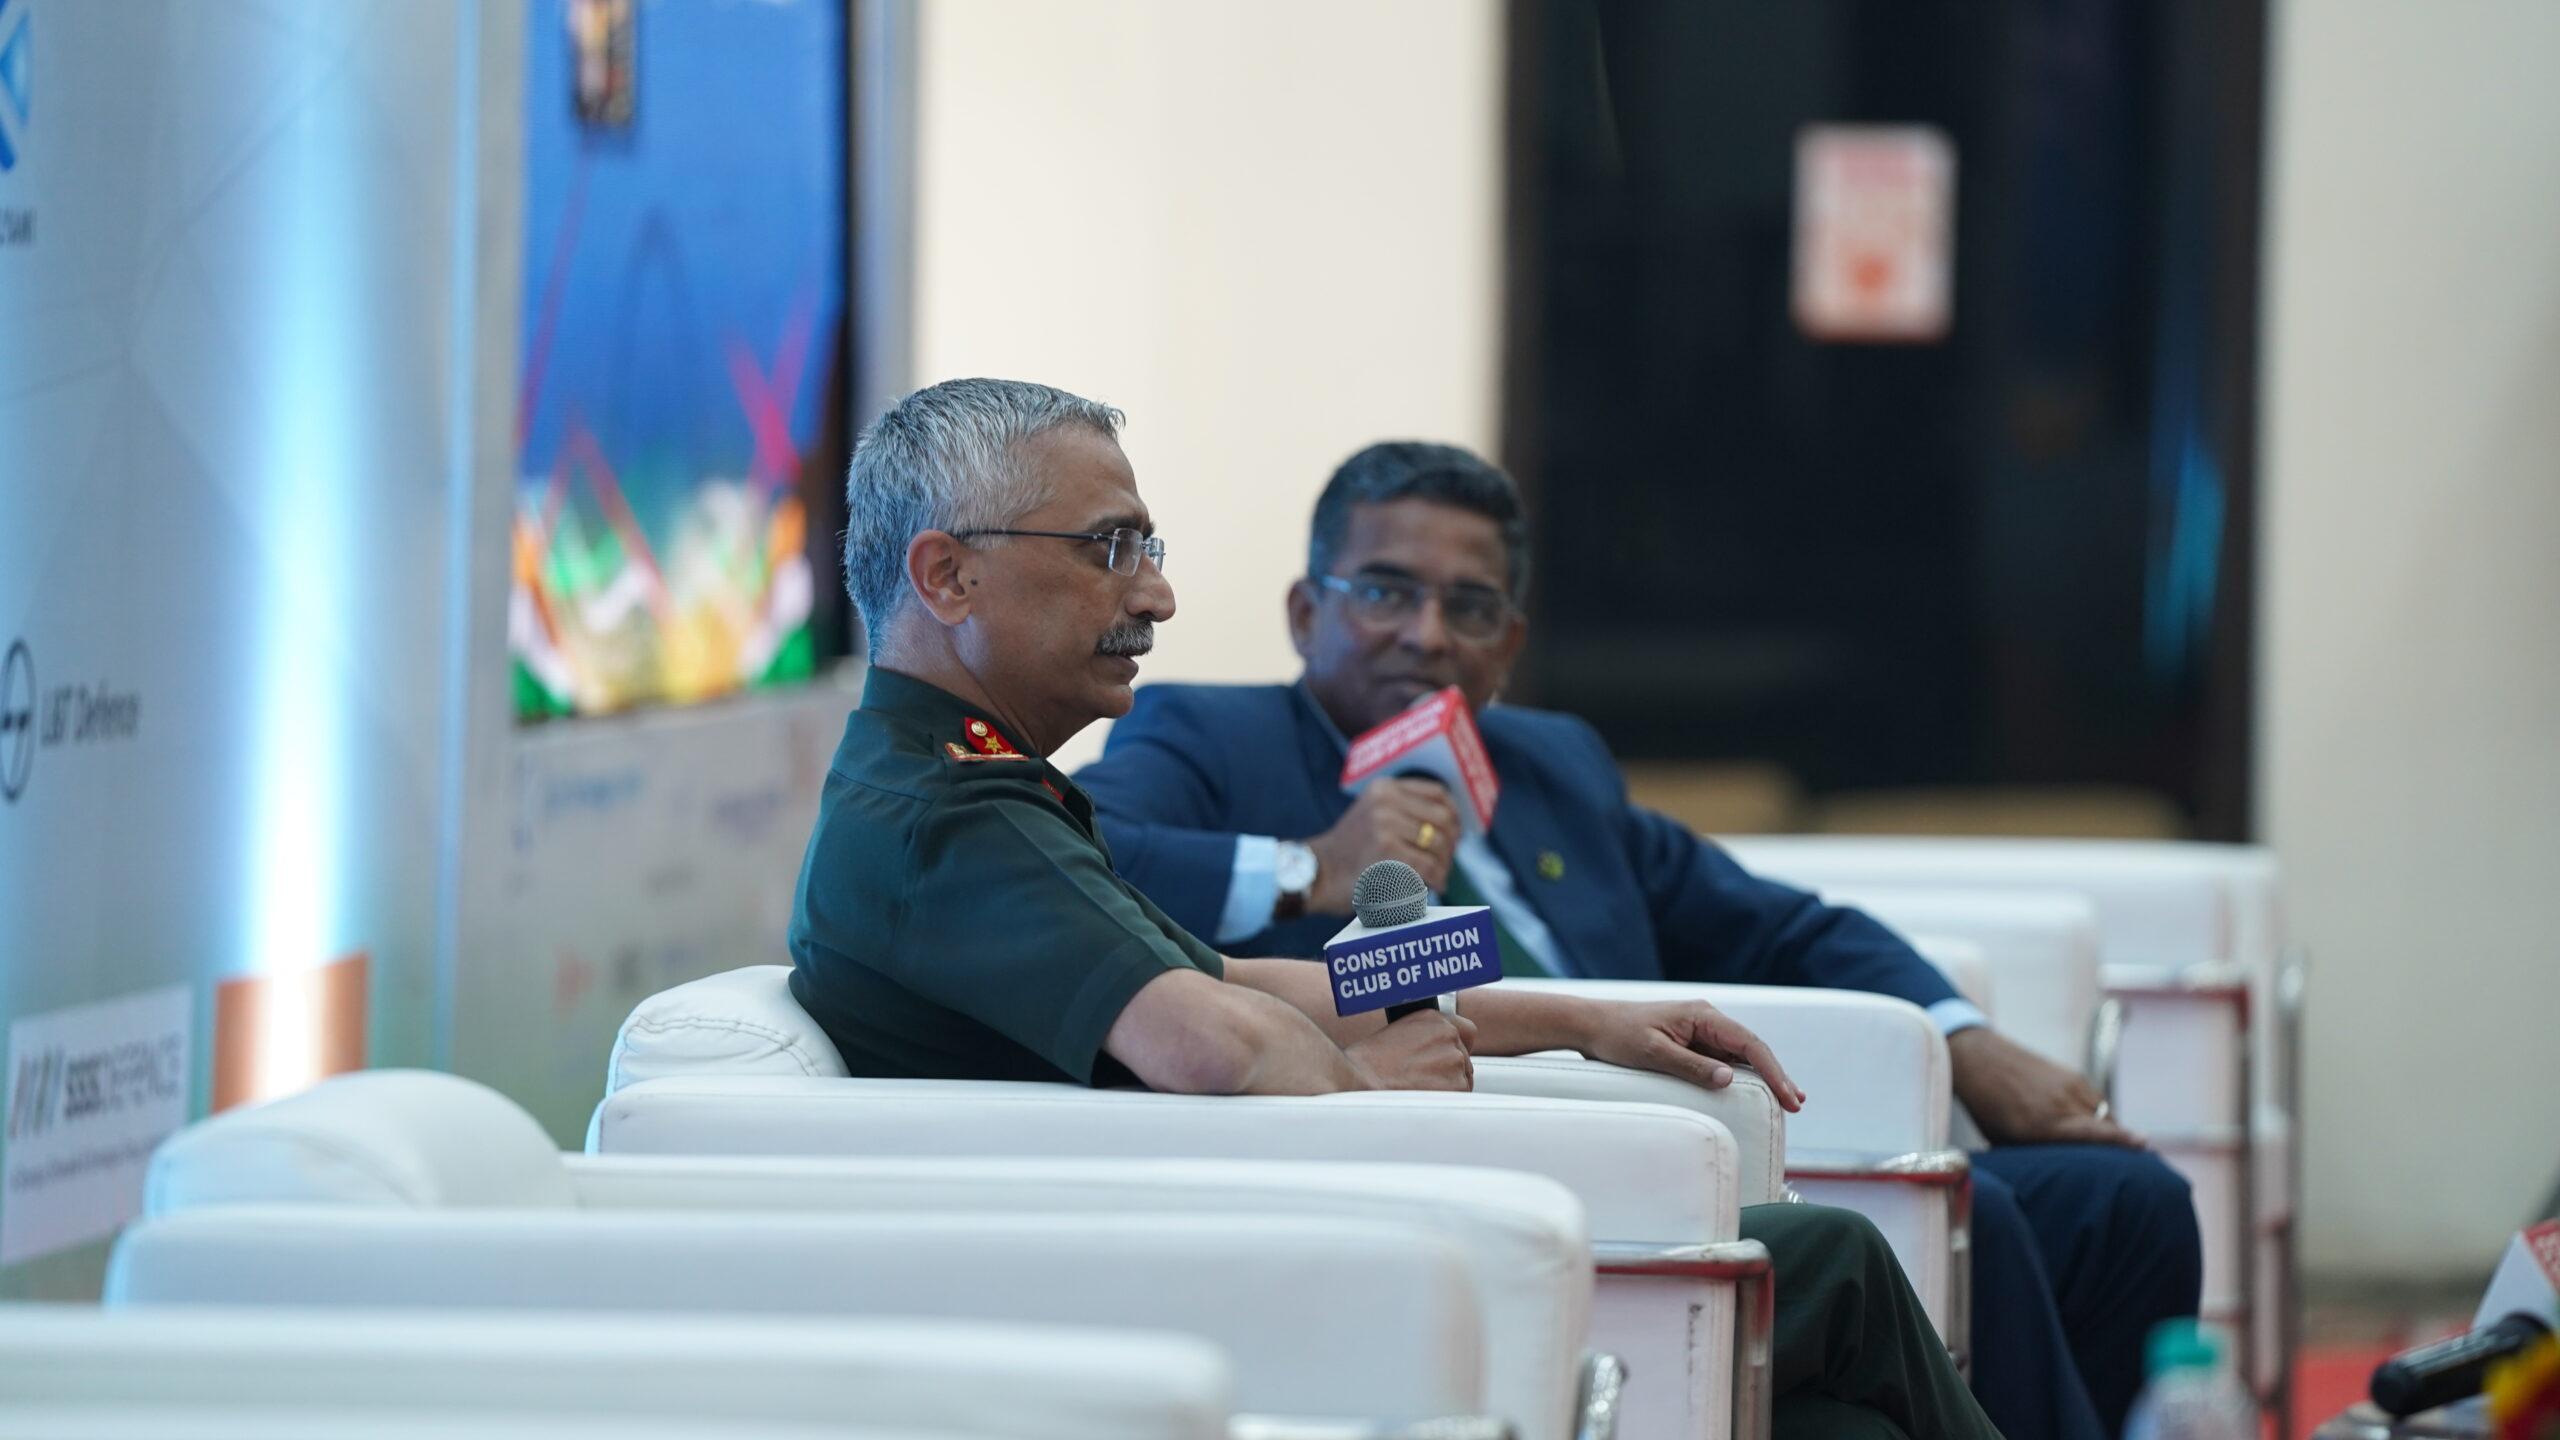 Ladakh Standoff: Breakthrough in India-China Talks Imminent